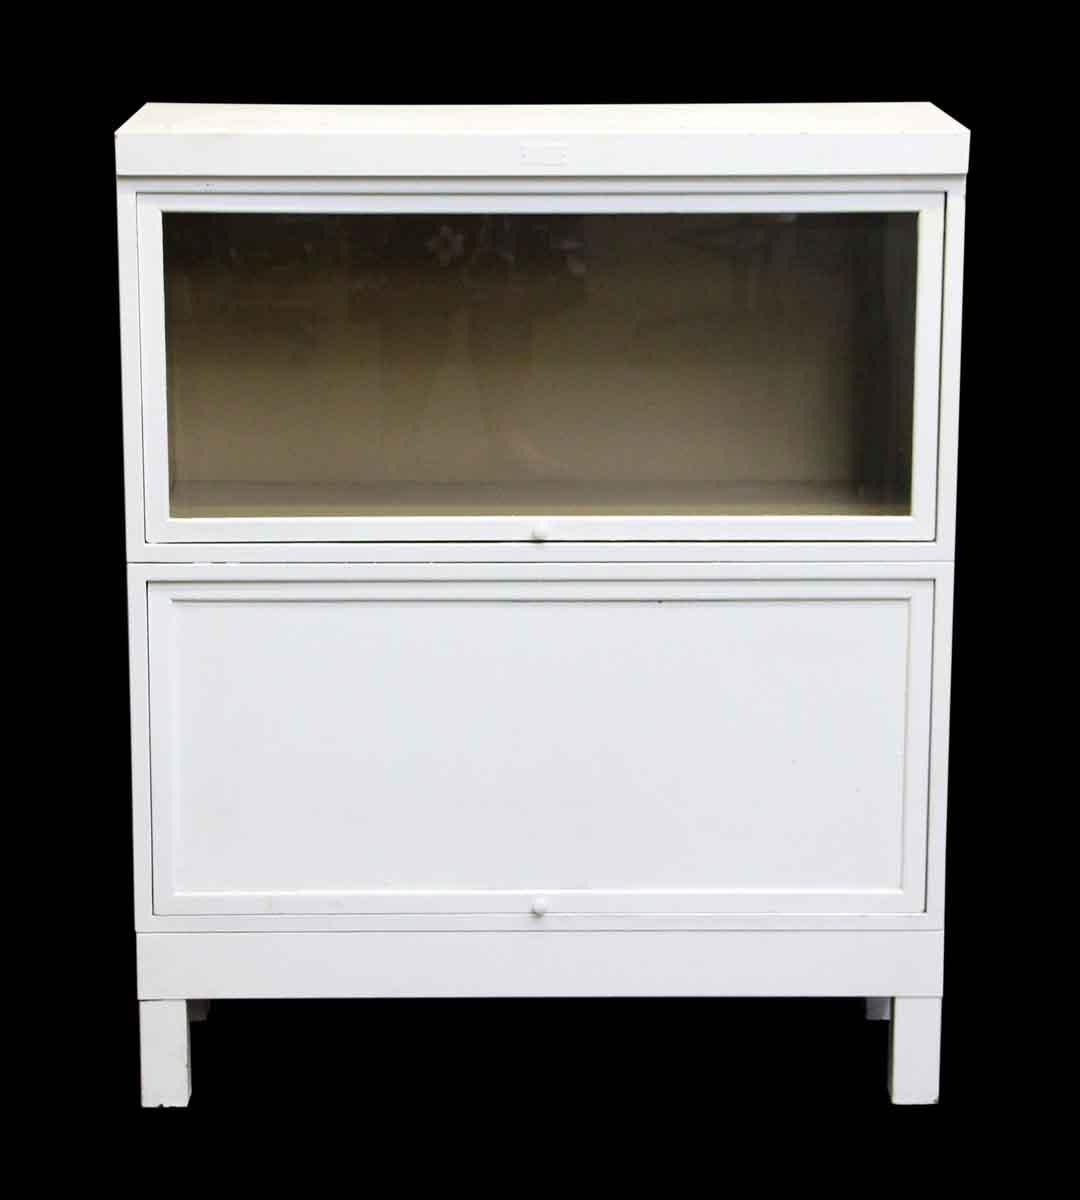 Steel Barrister Bookcase: Vintage White Steel Barrister Bookcase